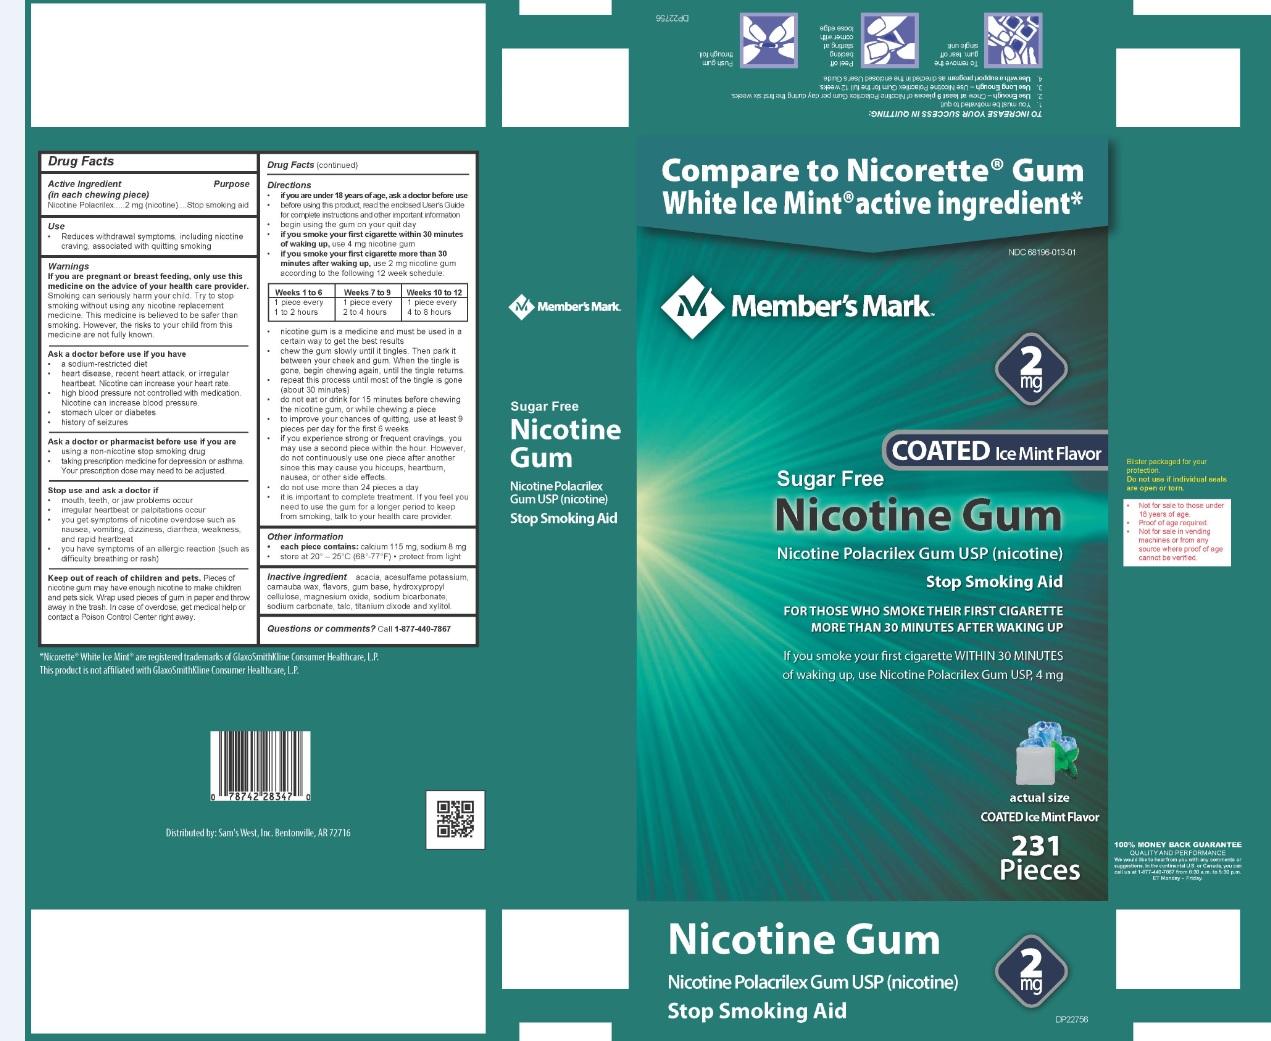 Nicotine Polacrilex Gum USP 2 mg Ice Mint Flavor